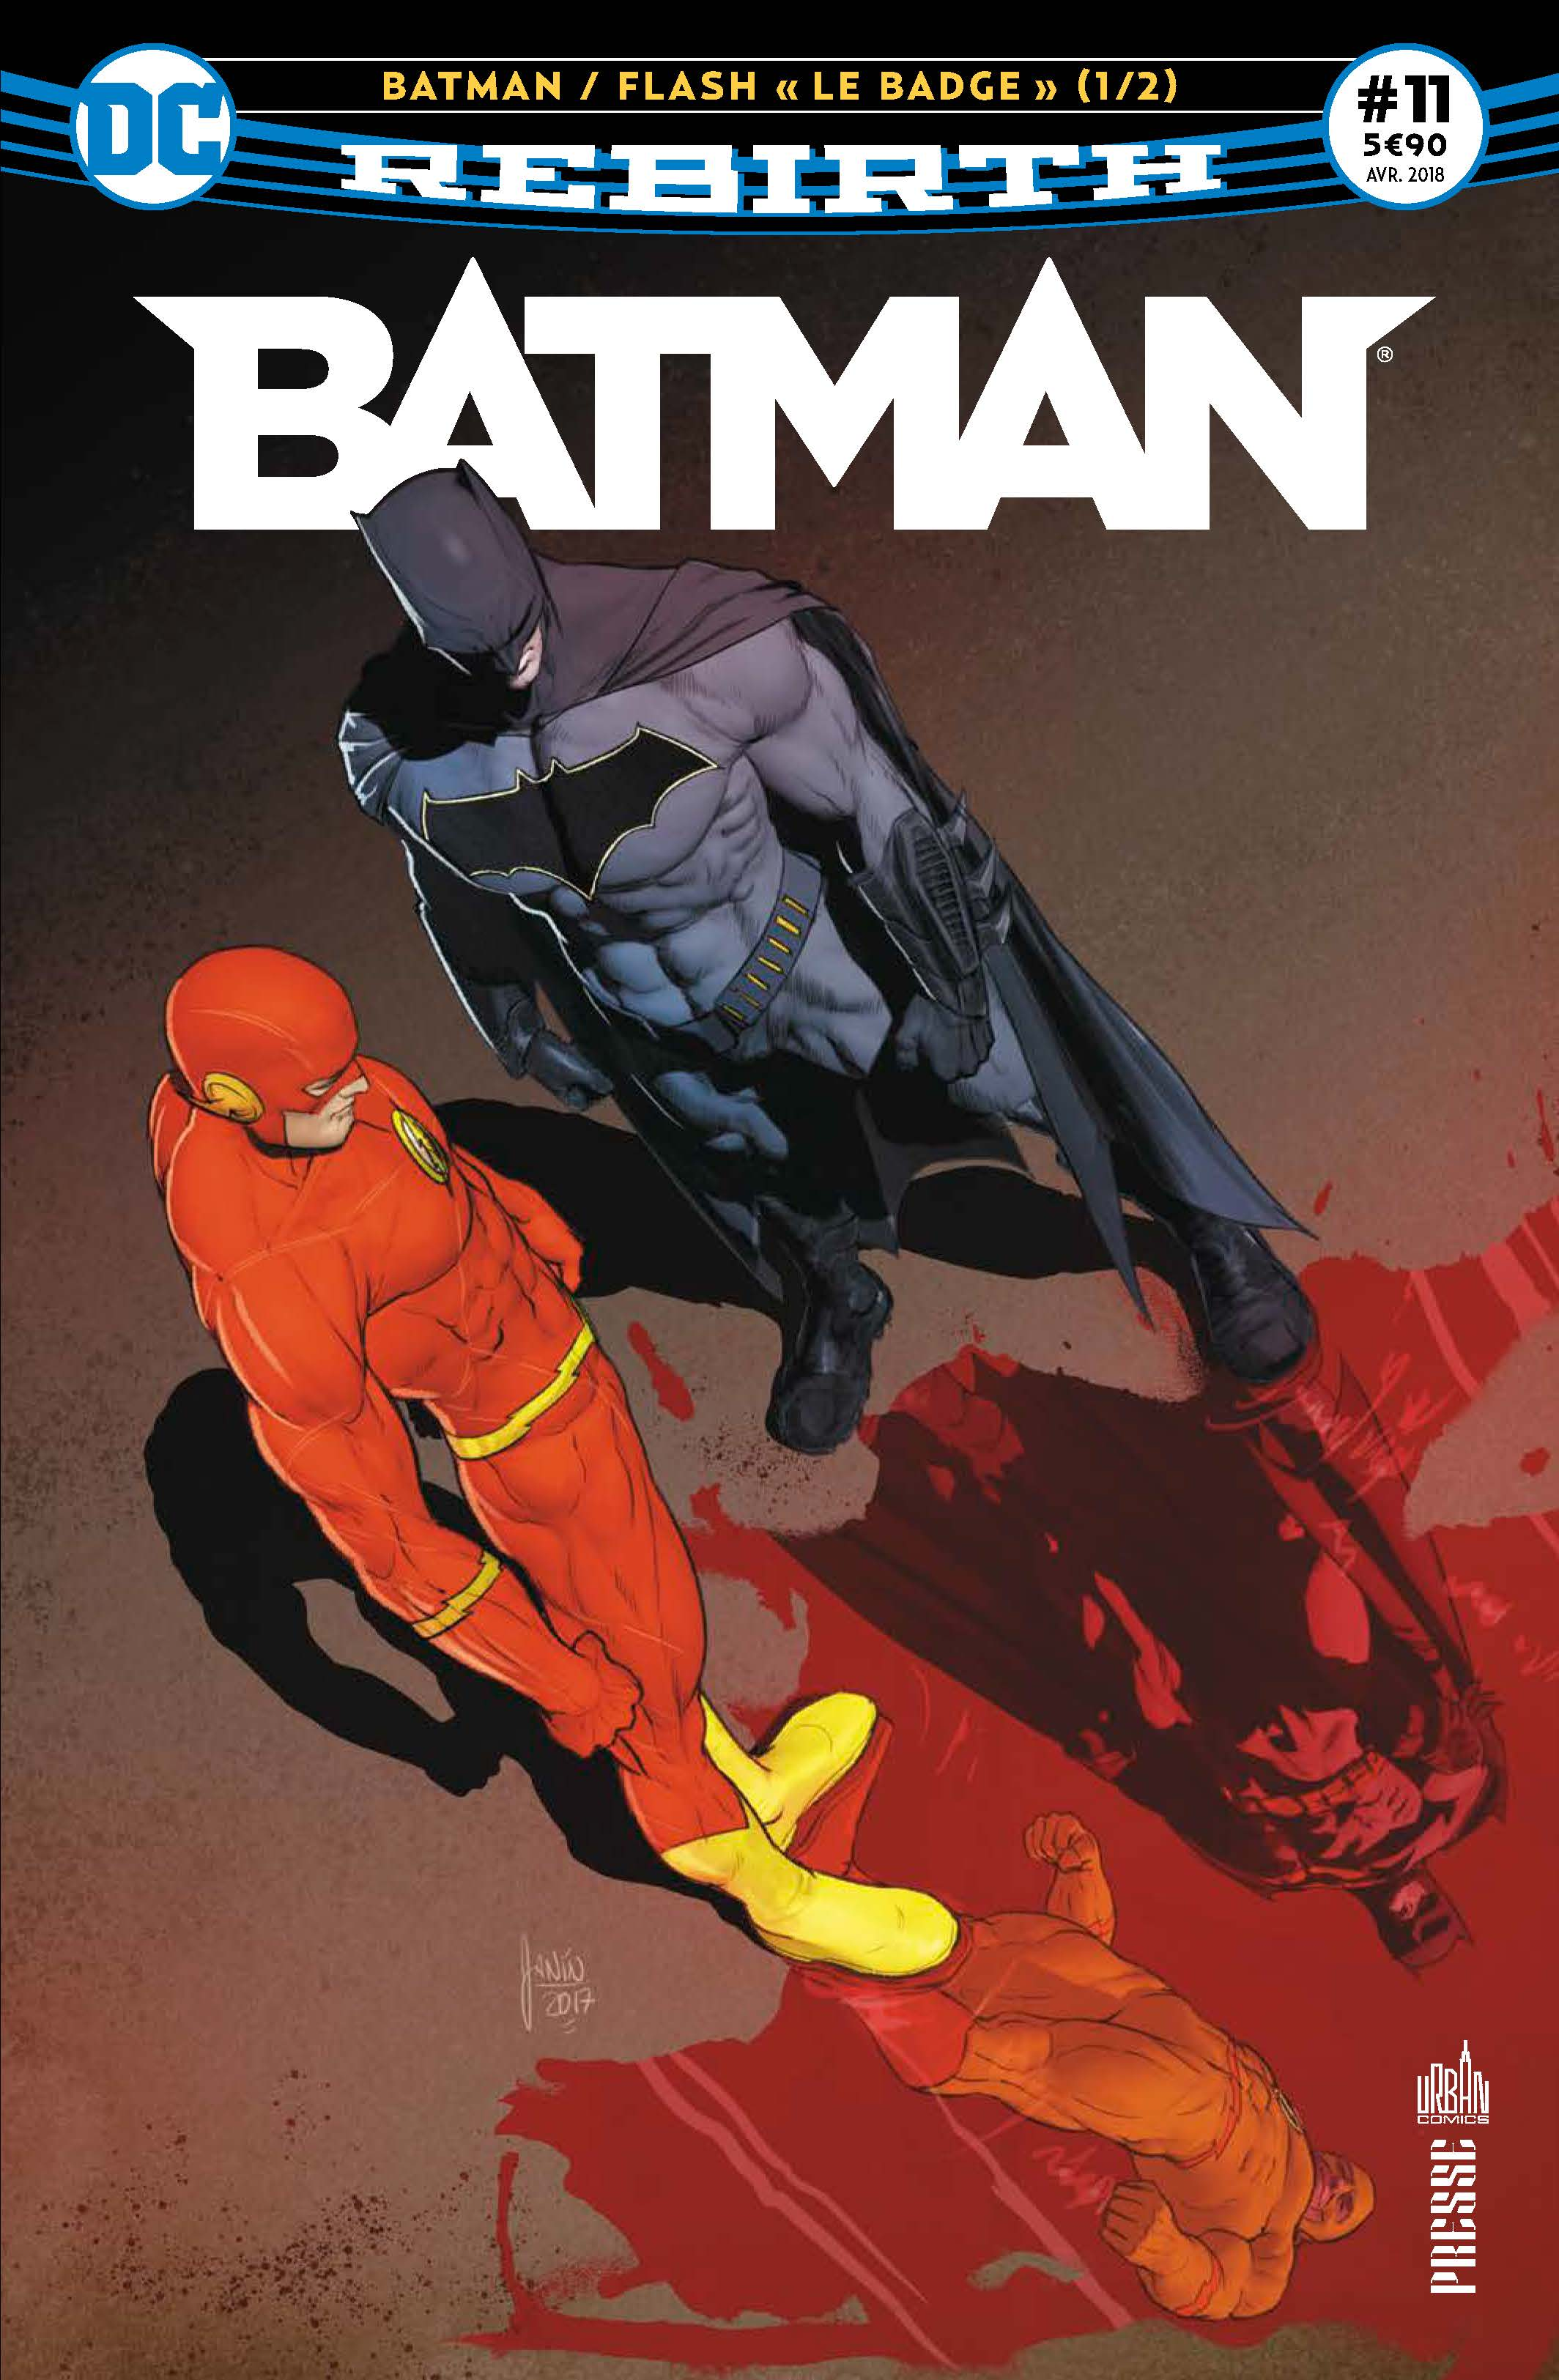 Batman Rebirth 11 - Le badge 1/2